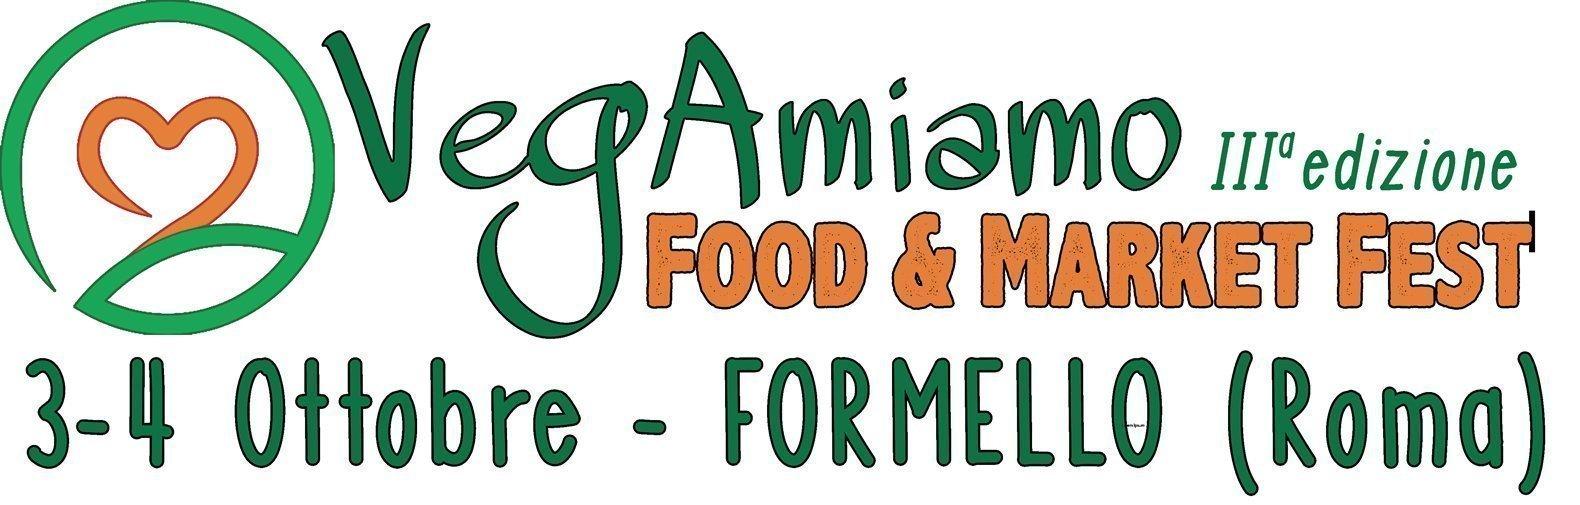 VegAmiamo Food & Market Fest Rome